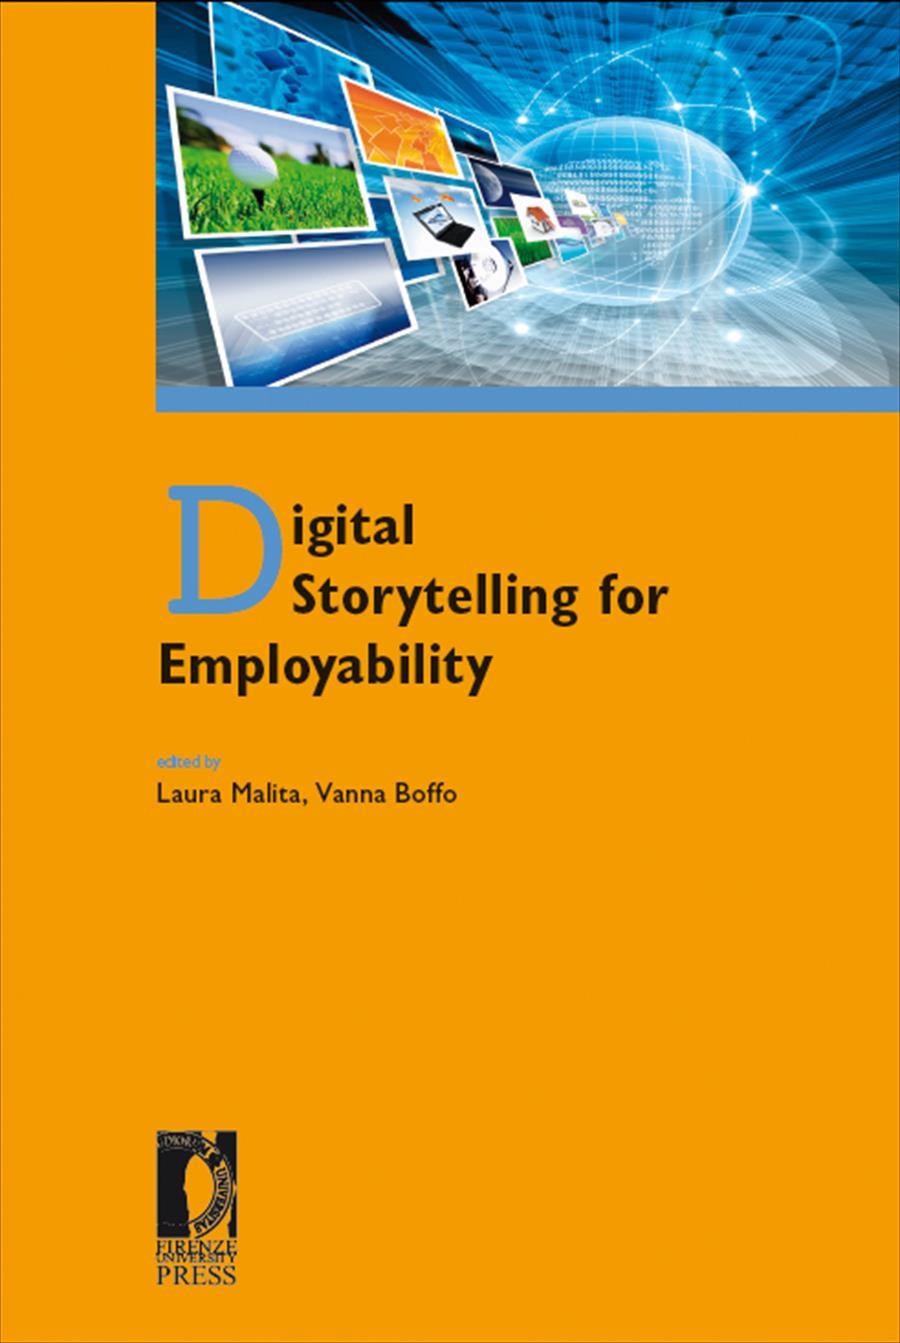 Digital Storytelling for Employability